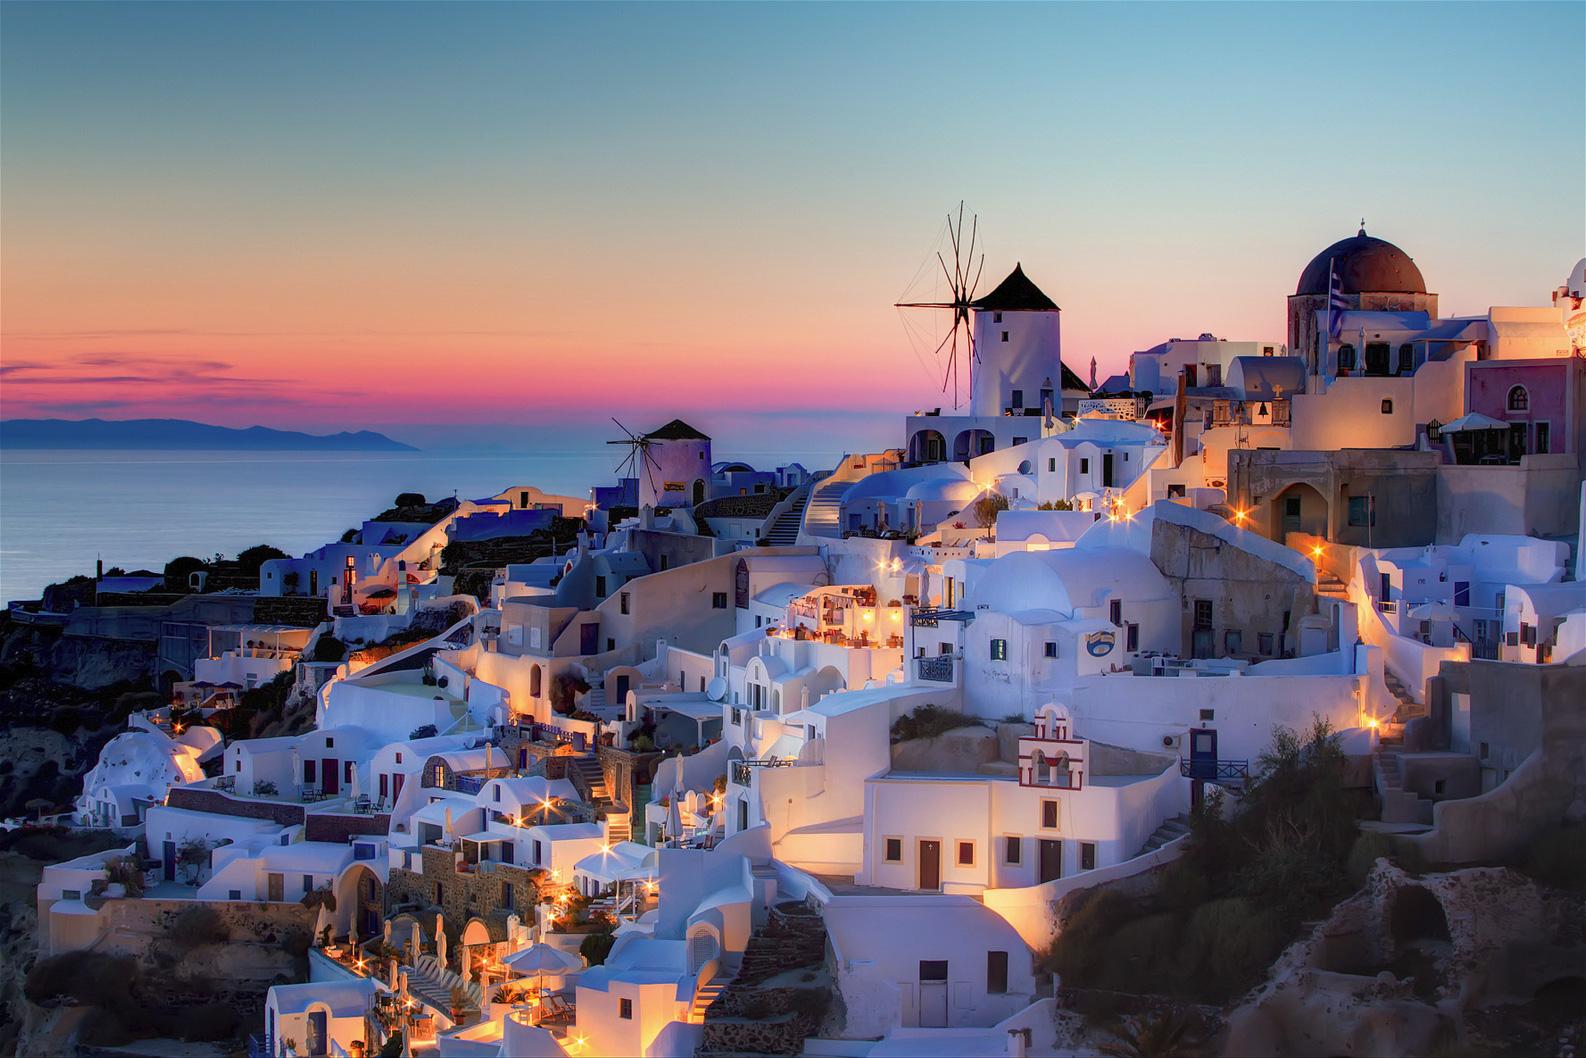 santorini-greece-whichgreekislandcouk